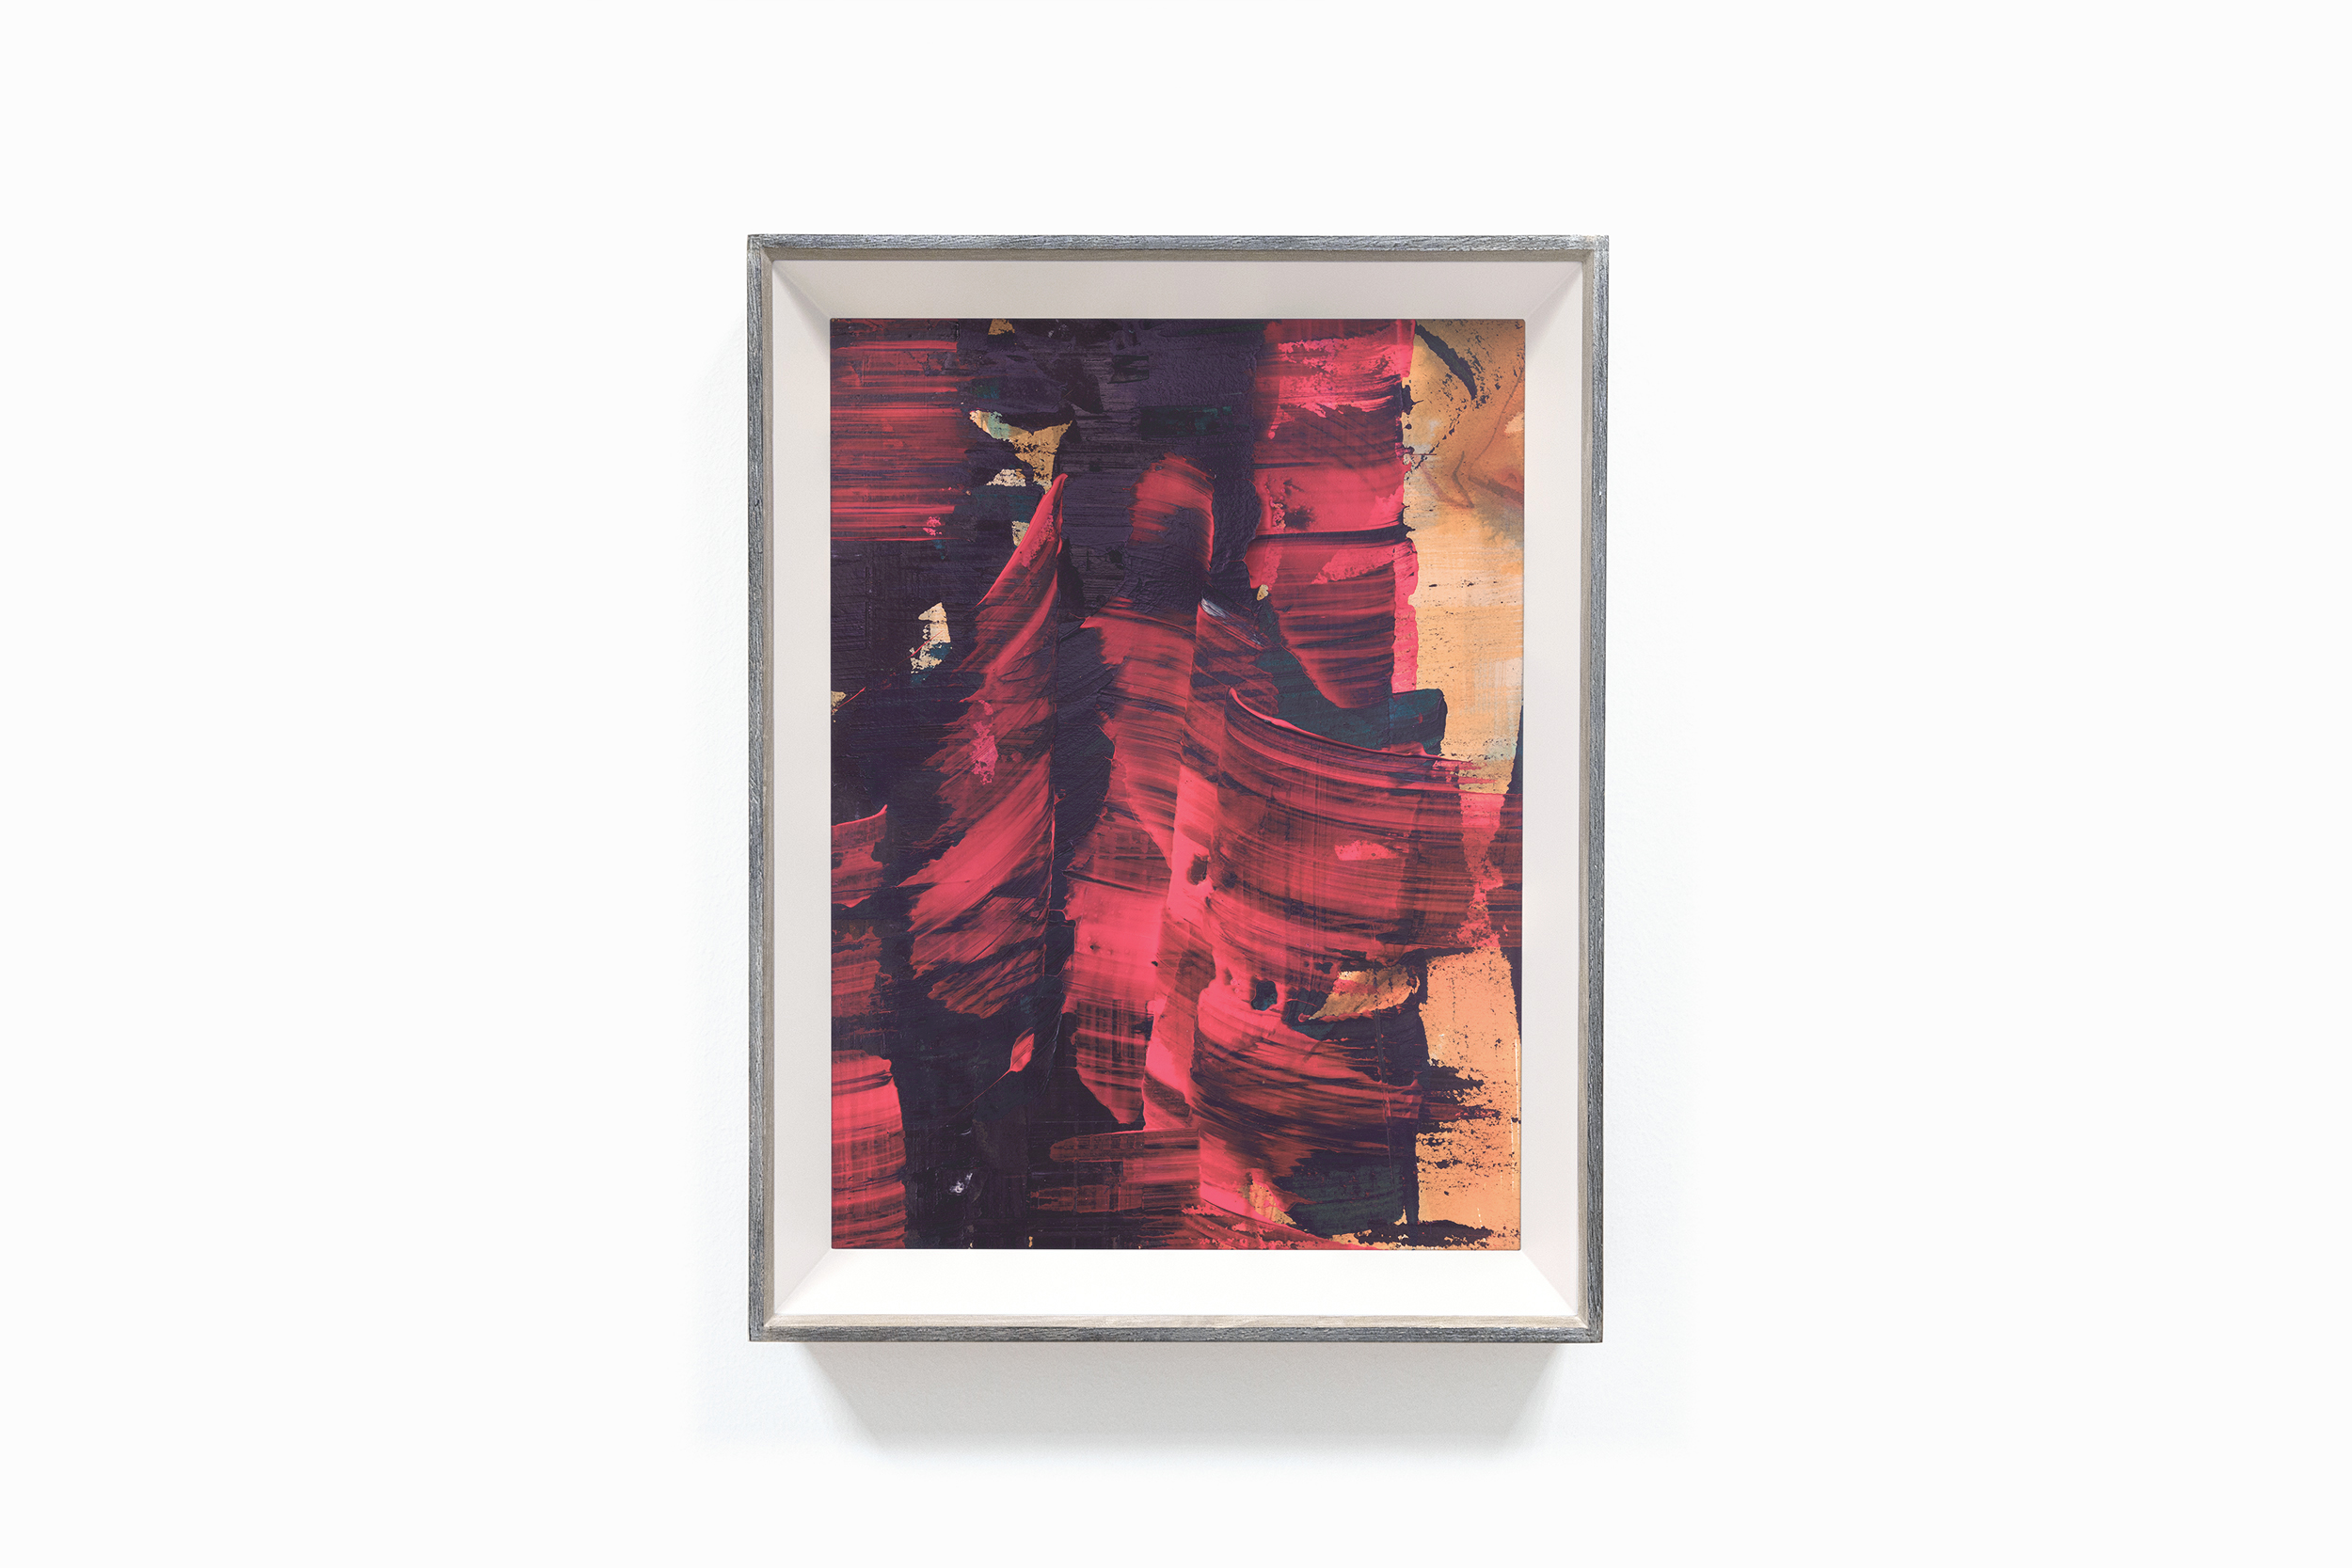 bonjourmolotov Untitled Illustration Ilustracao painting pintura acrylic acrílico canvas tela paper cardboard mdf Andre Gigante A04N.jpg